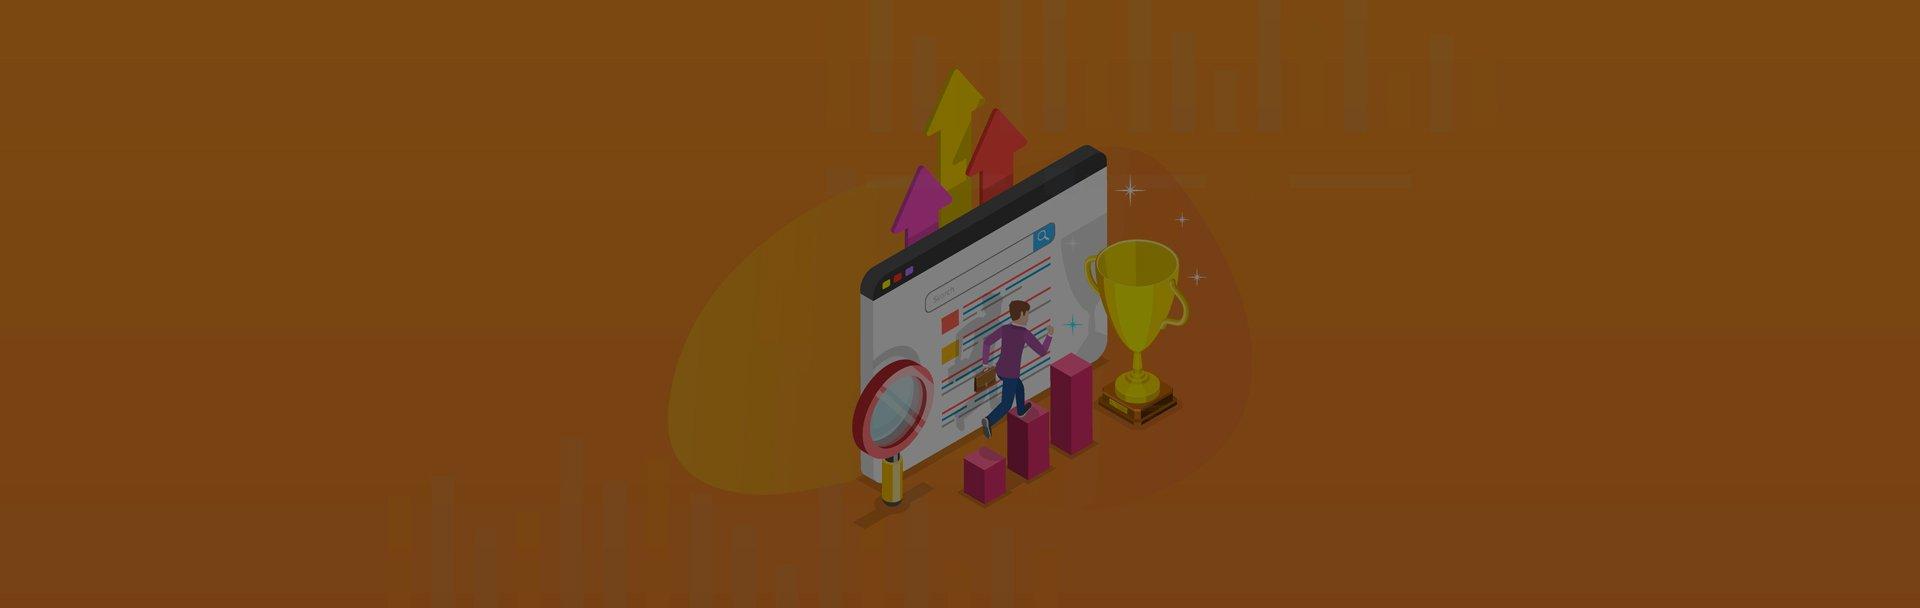 Blog-Solucionweb-Como-te-ayuda-Solucionweb-en-tu-estrategia-de-Inbound-Marketingai-03